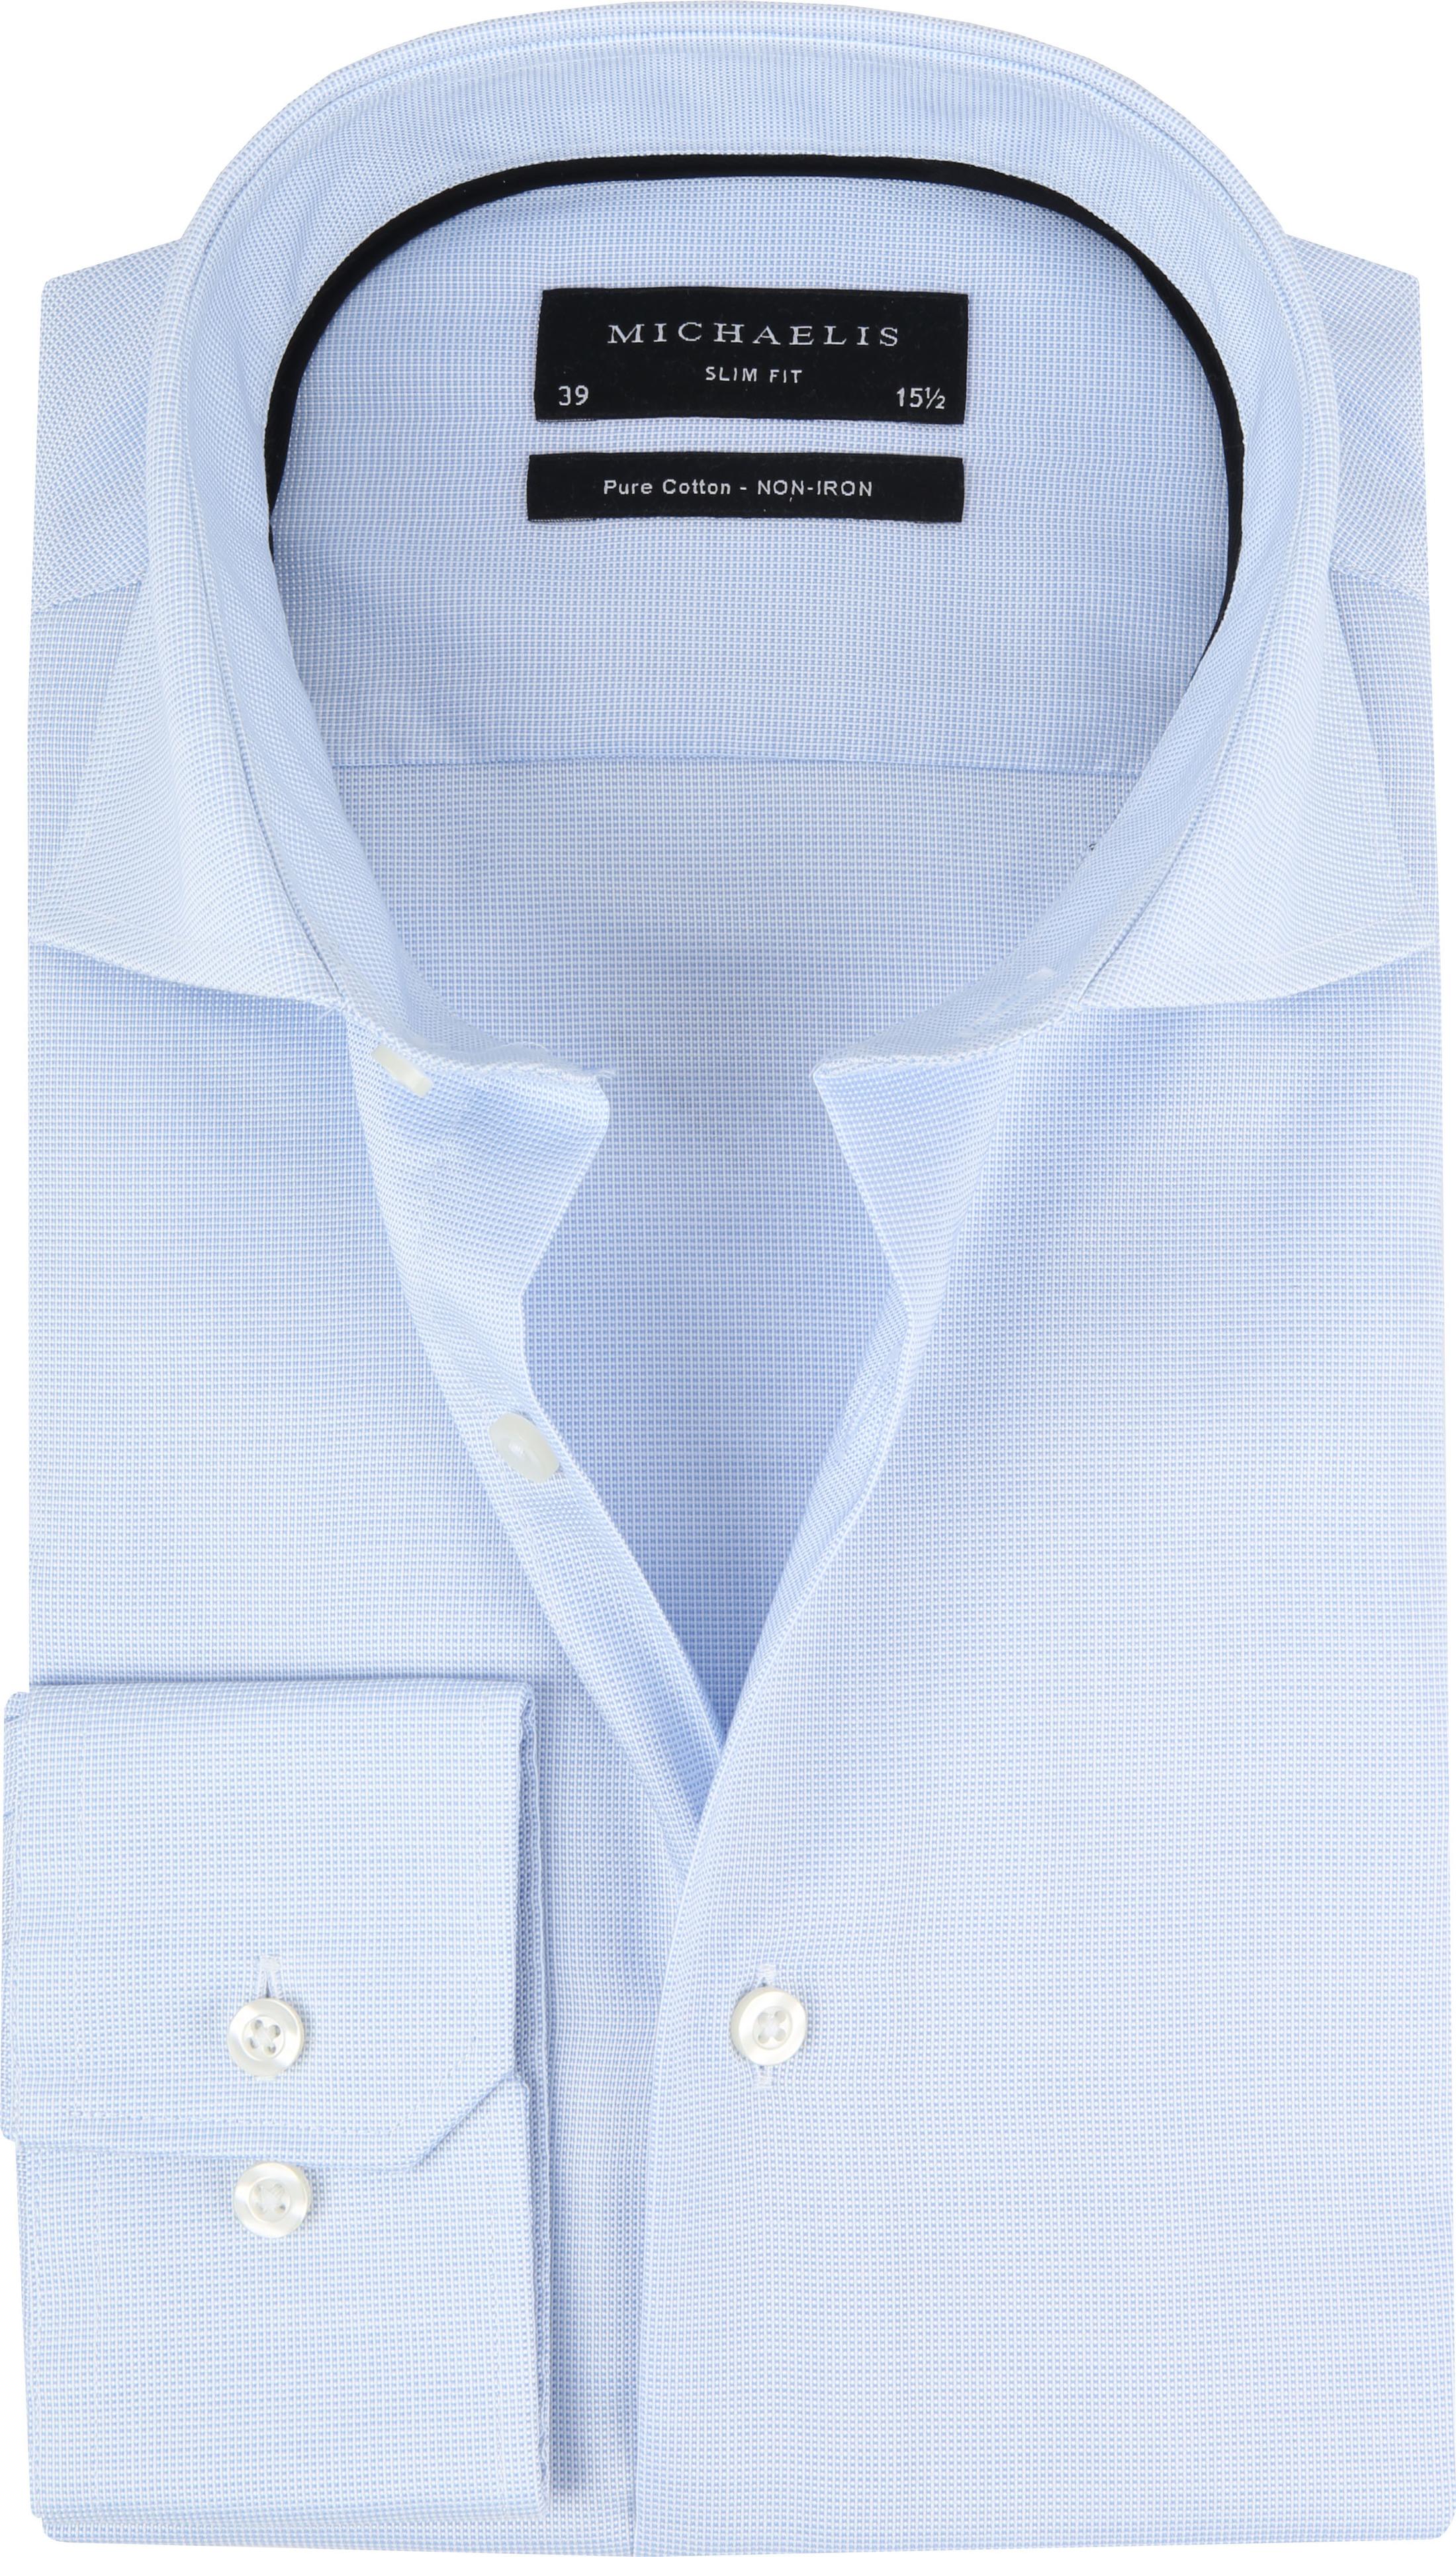 Michaelis Overhemd SlimFit Blue Dessin foto 0